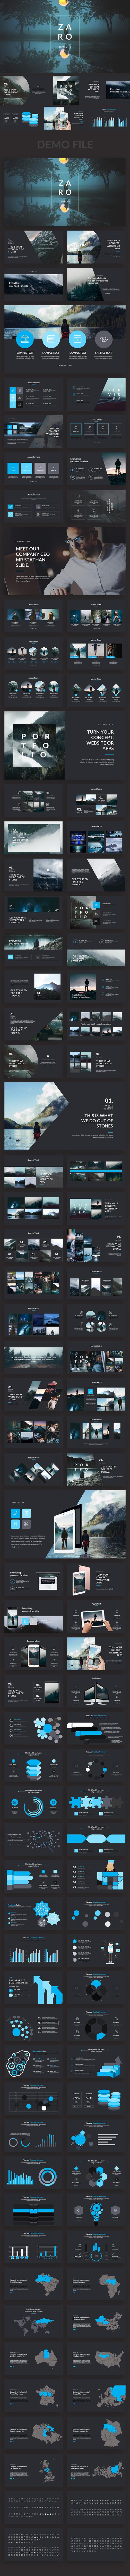 Zaro Premium Powerpoint Template - Creative PowerPoint Templates